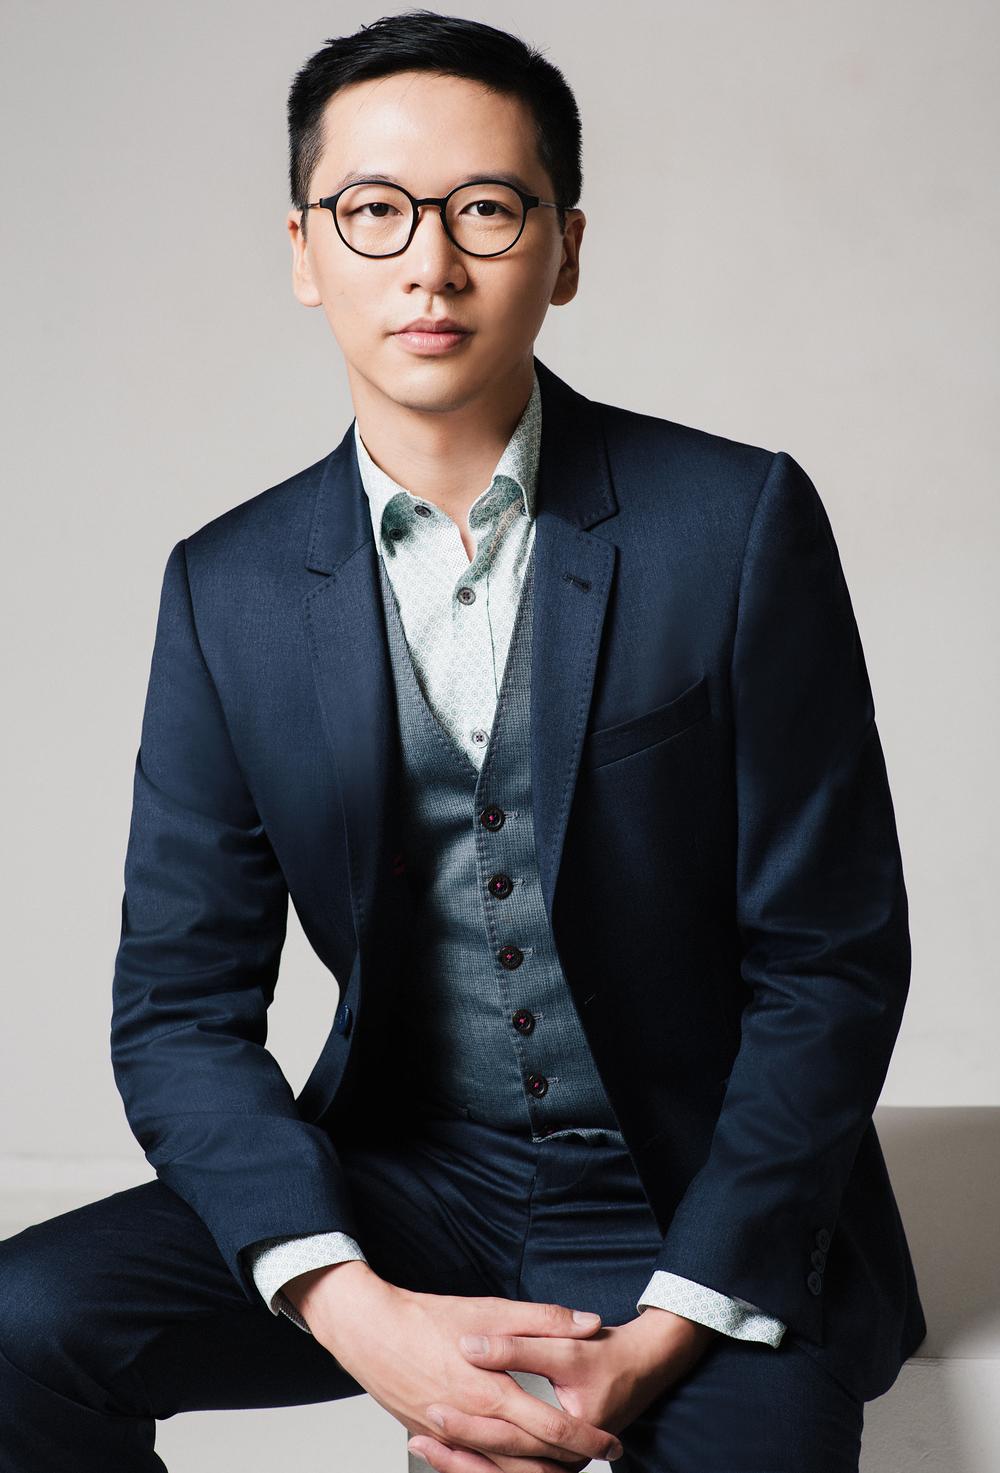 CEO-portrait-corporate-headshot-01.jpg